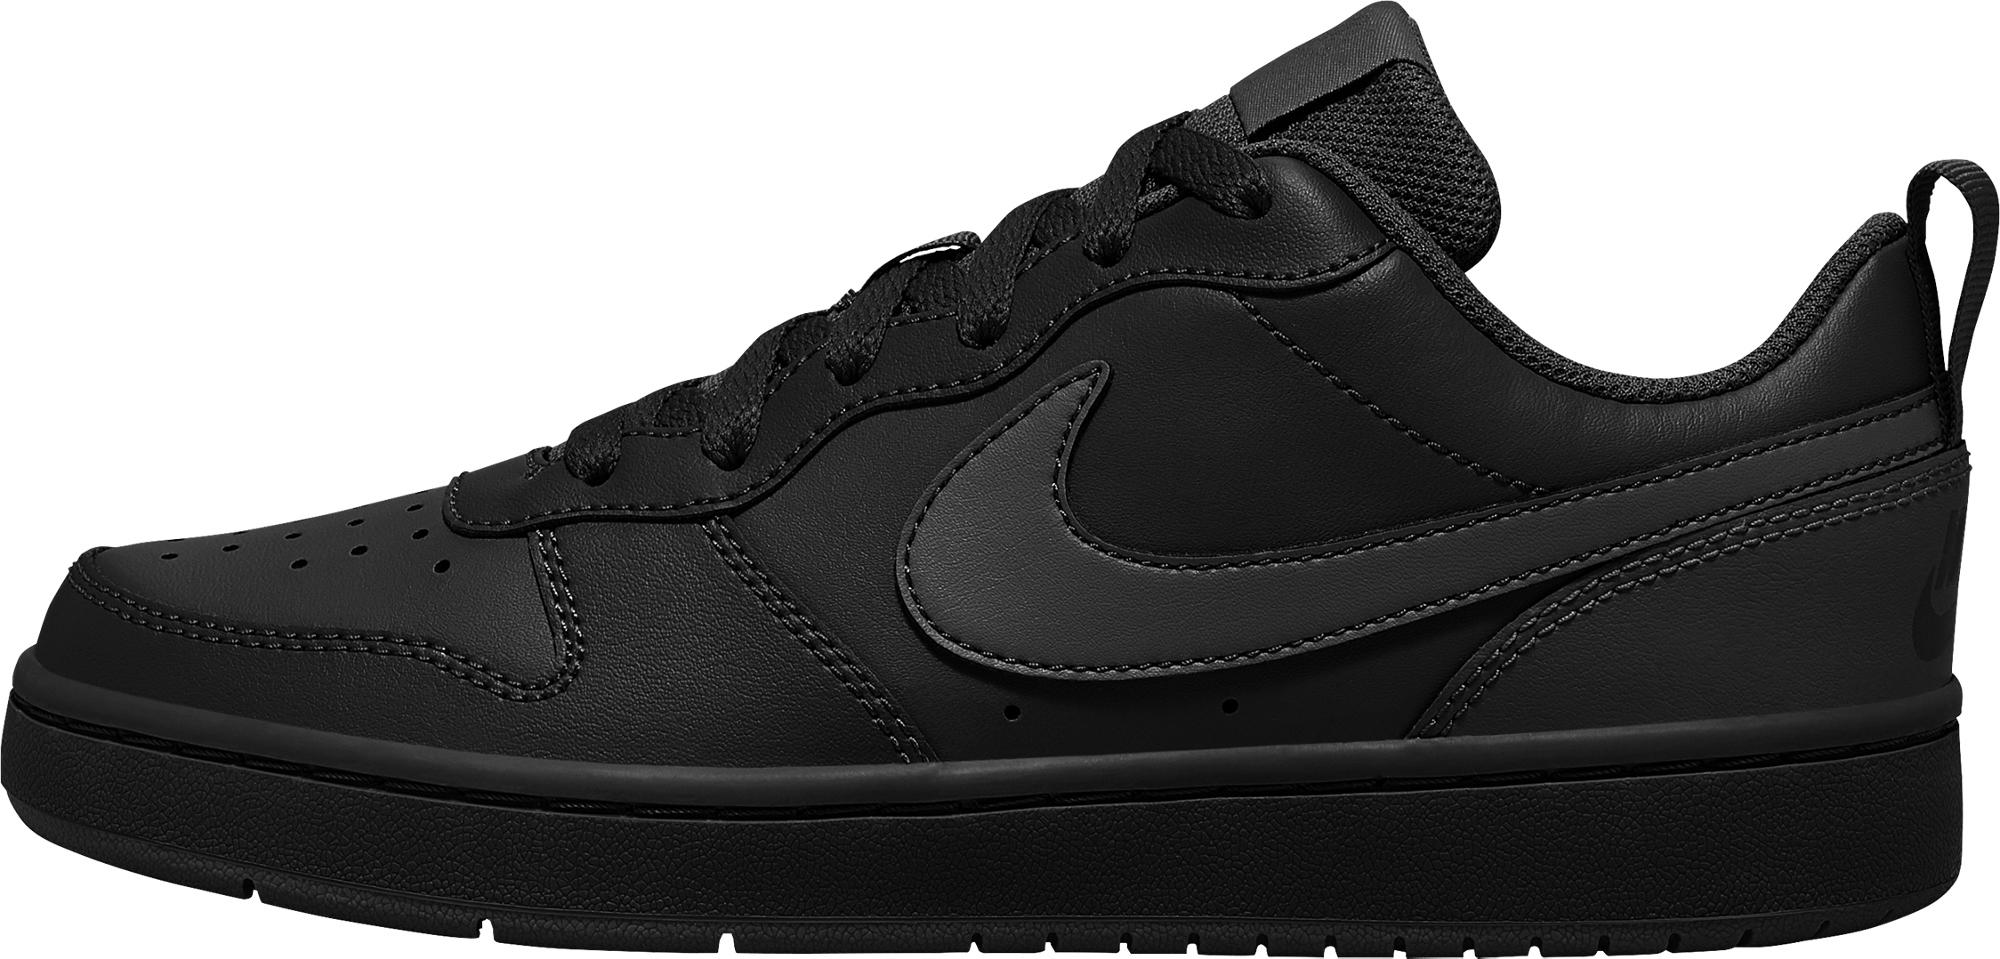 цена Nike Кеды для мальчиков Nike Court Borough Low 2, размер 34.5 онлайн в 2017 году